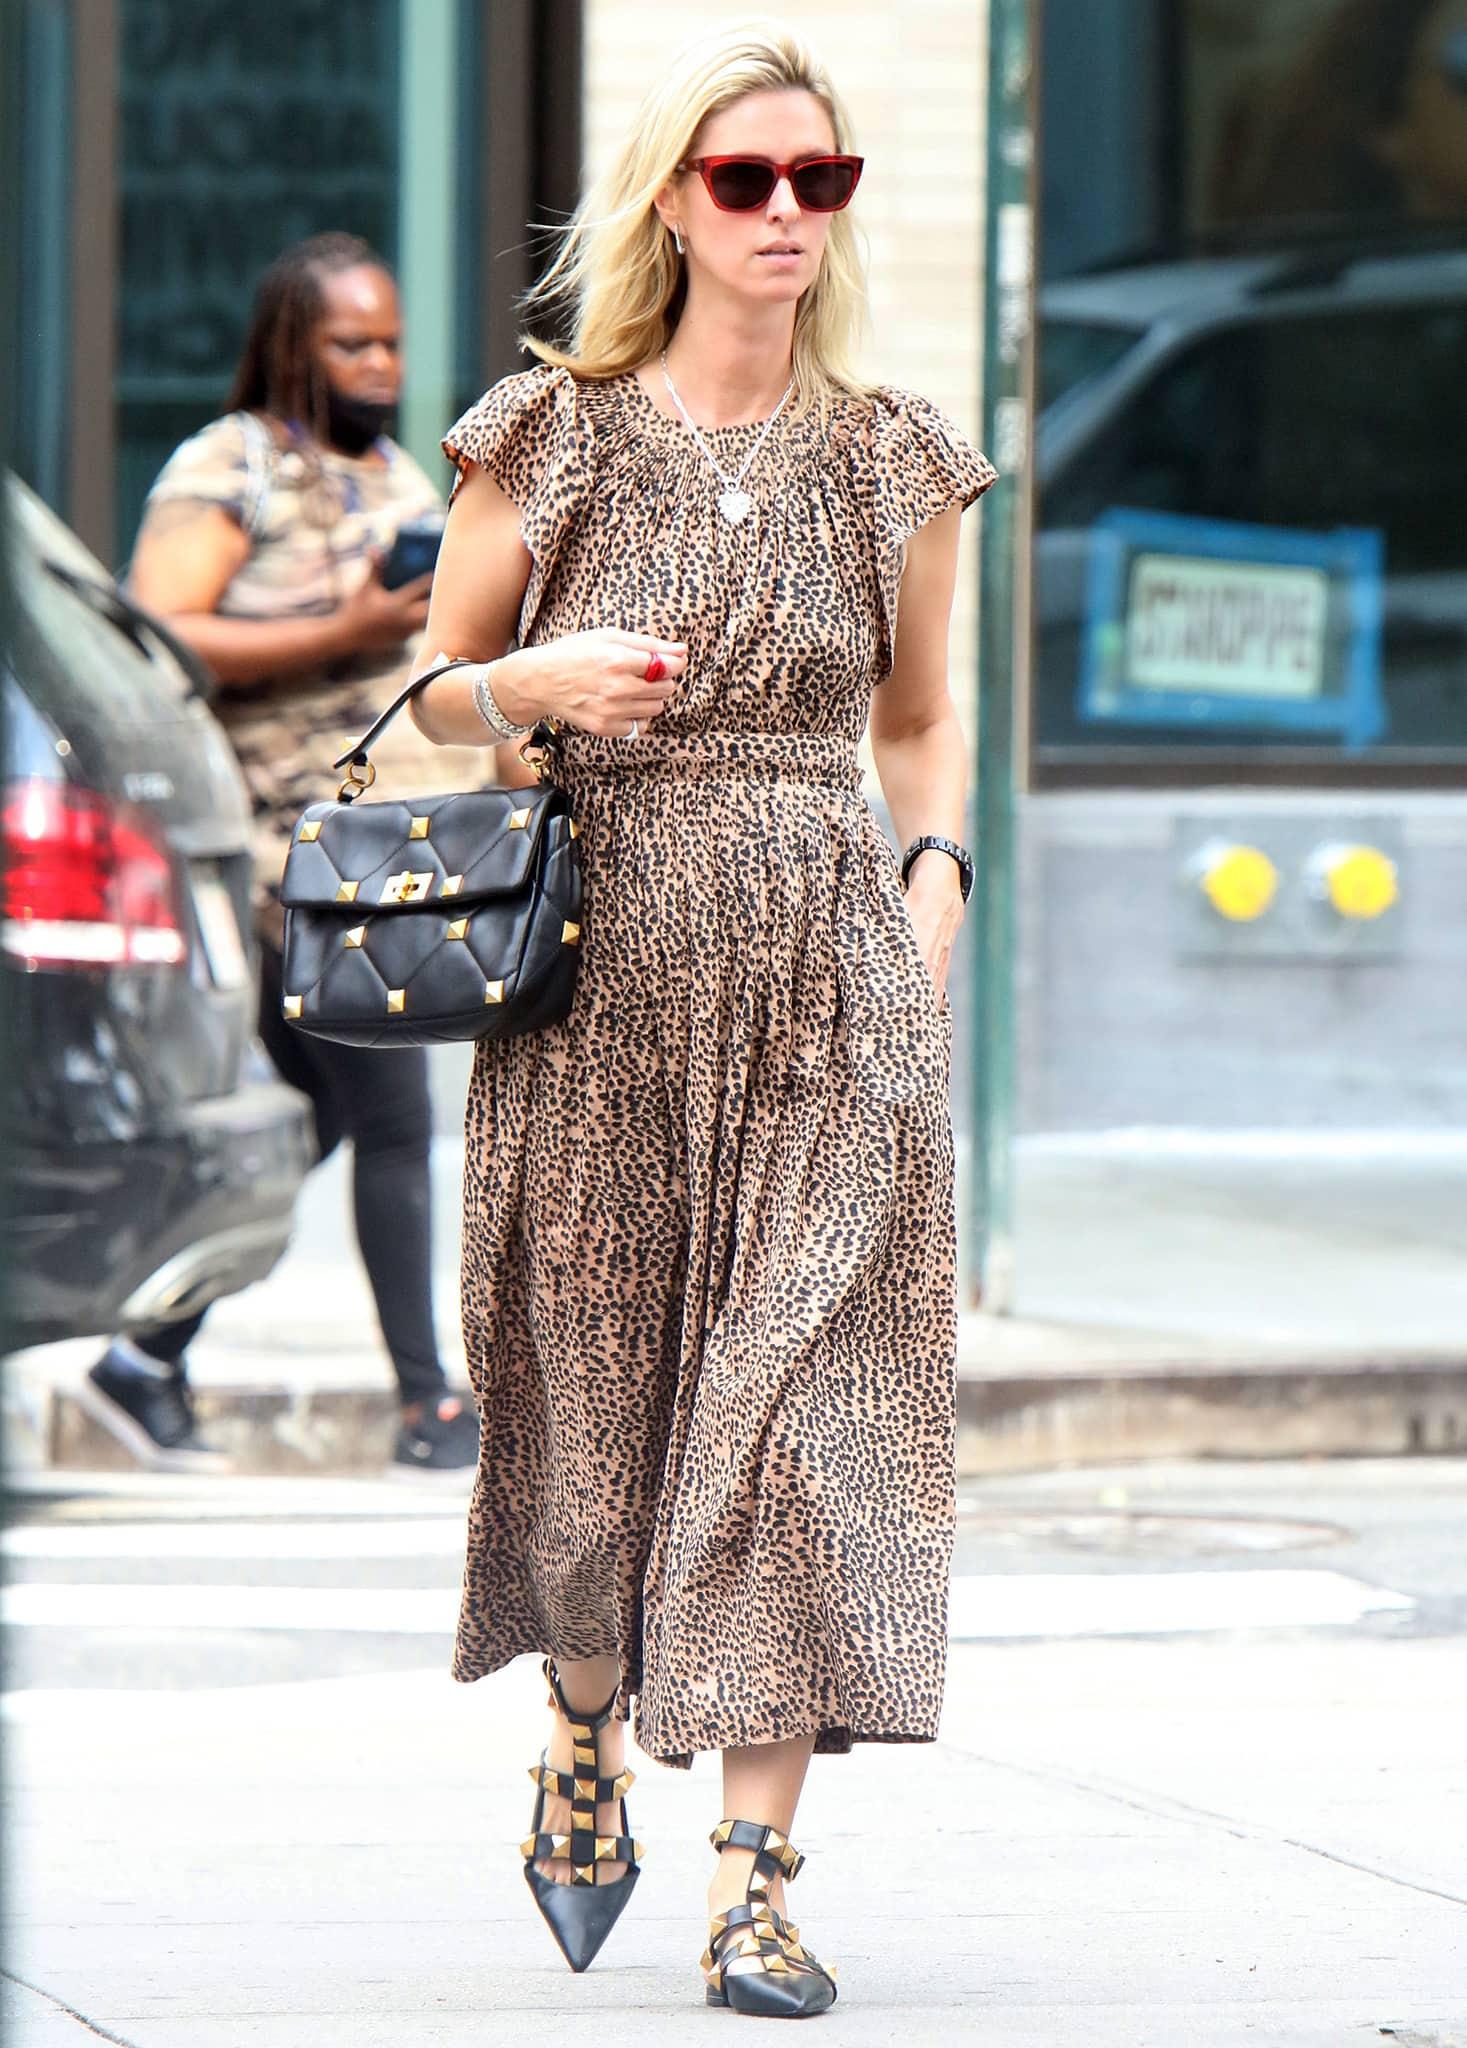 Nicky Hilton runs errands in Ulla Johnson leopard-print midi dress on June 7, 2021